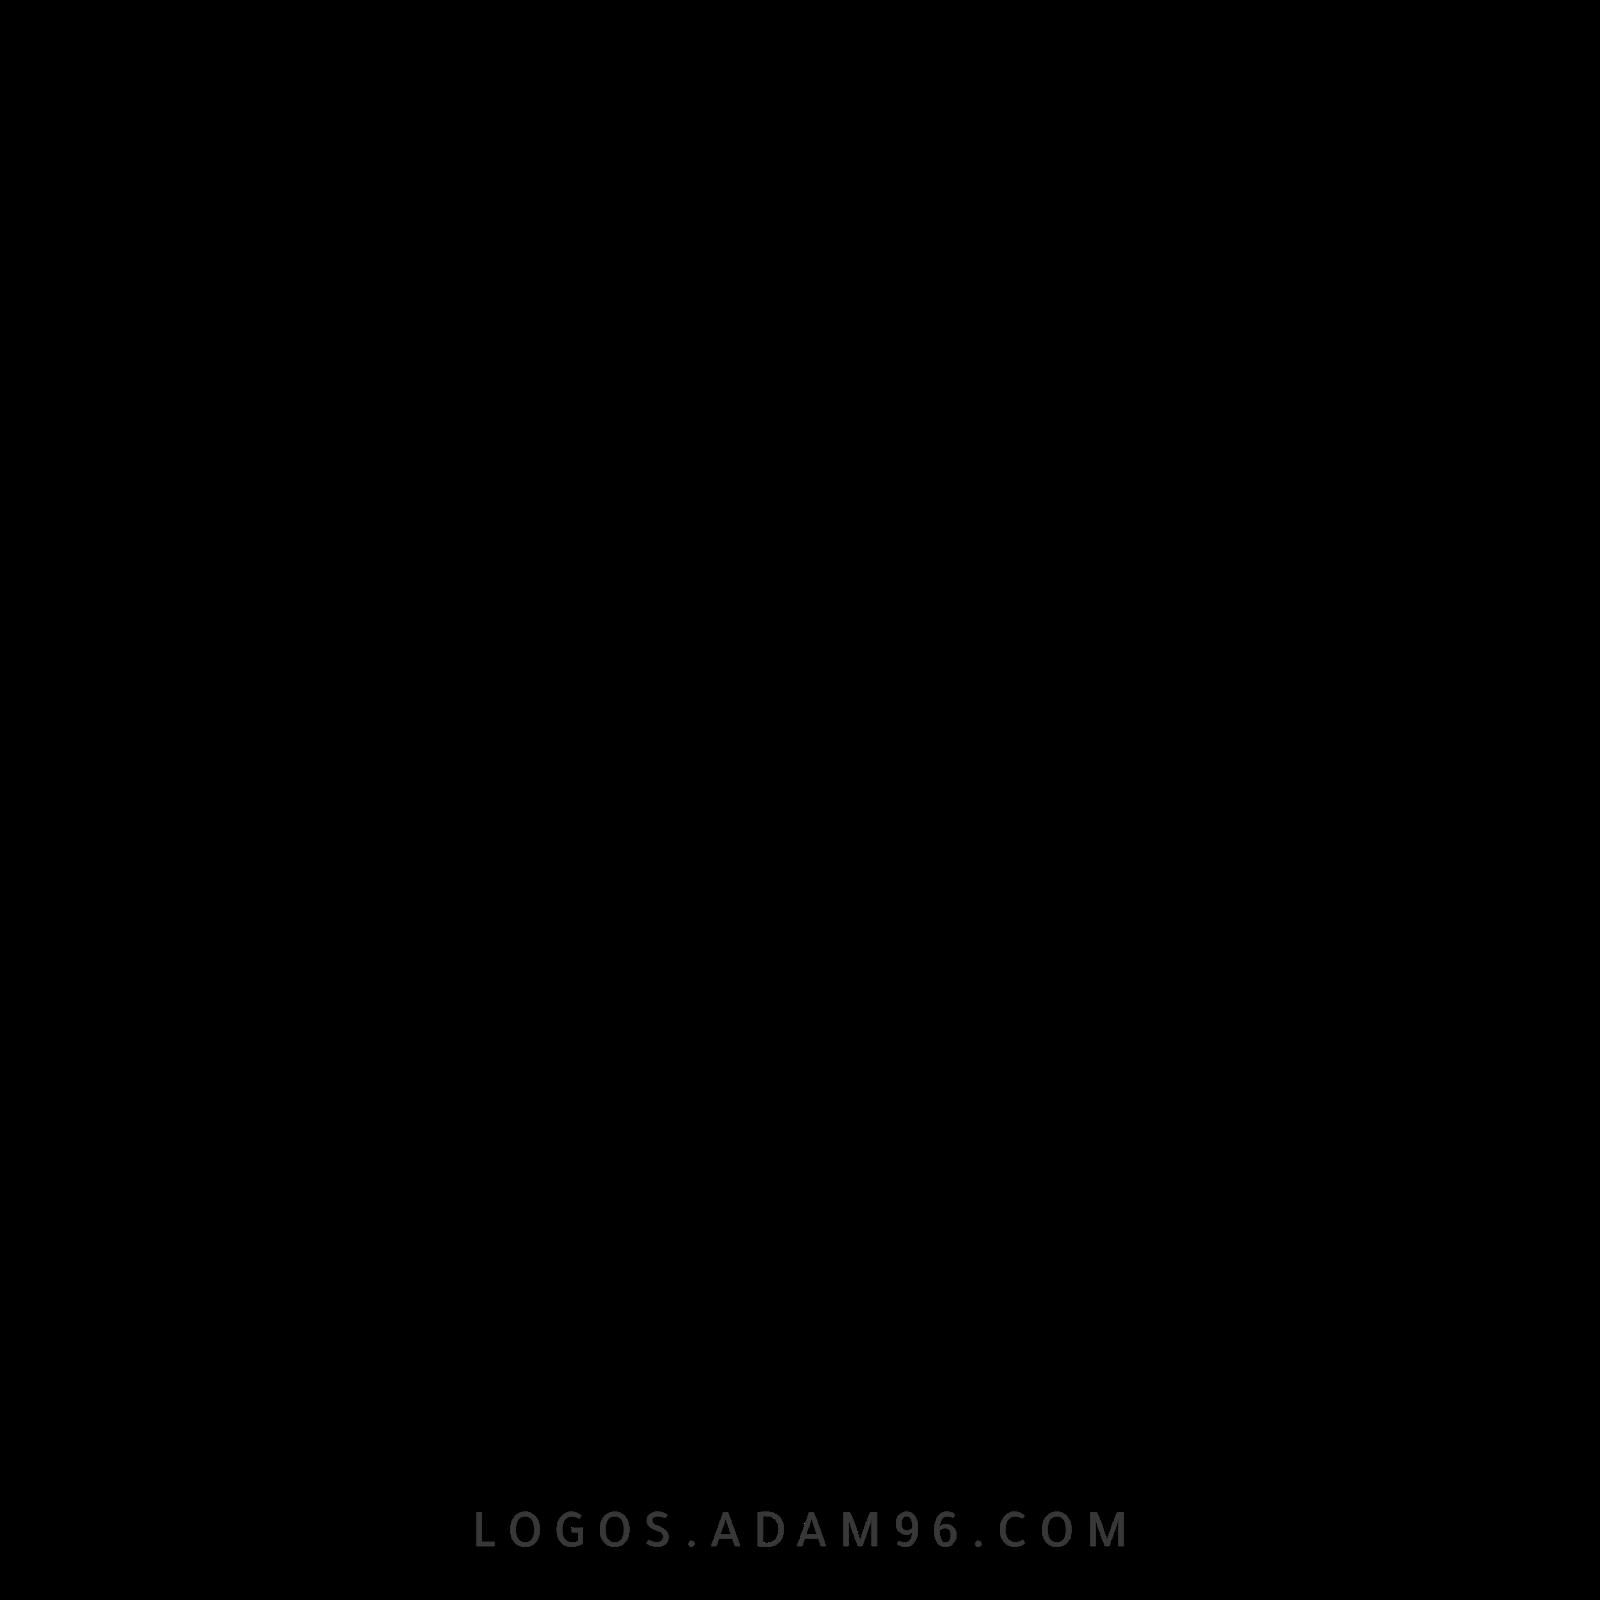 Under Armour Logo Original Png Download Logo For Free In 2020 Under Armour Logo Clothing Logo Under Armour